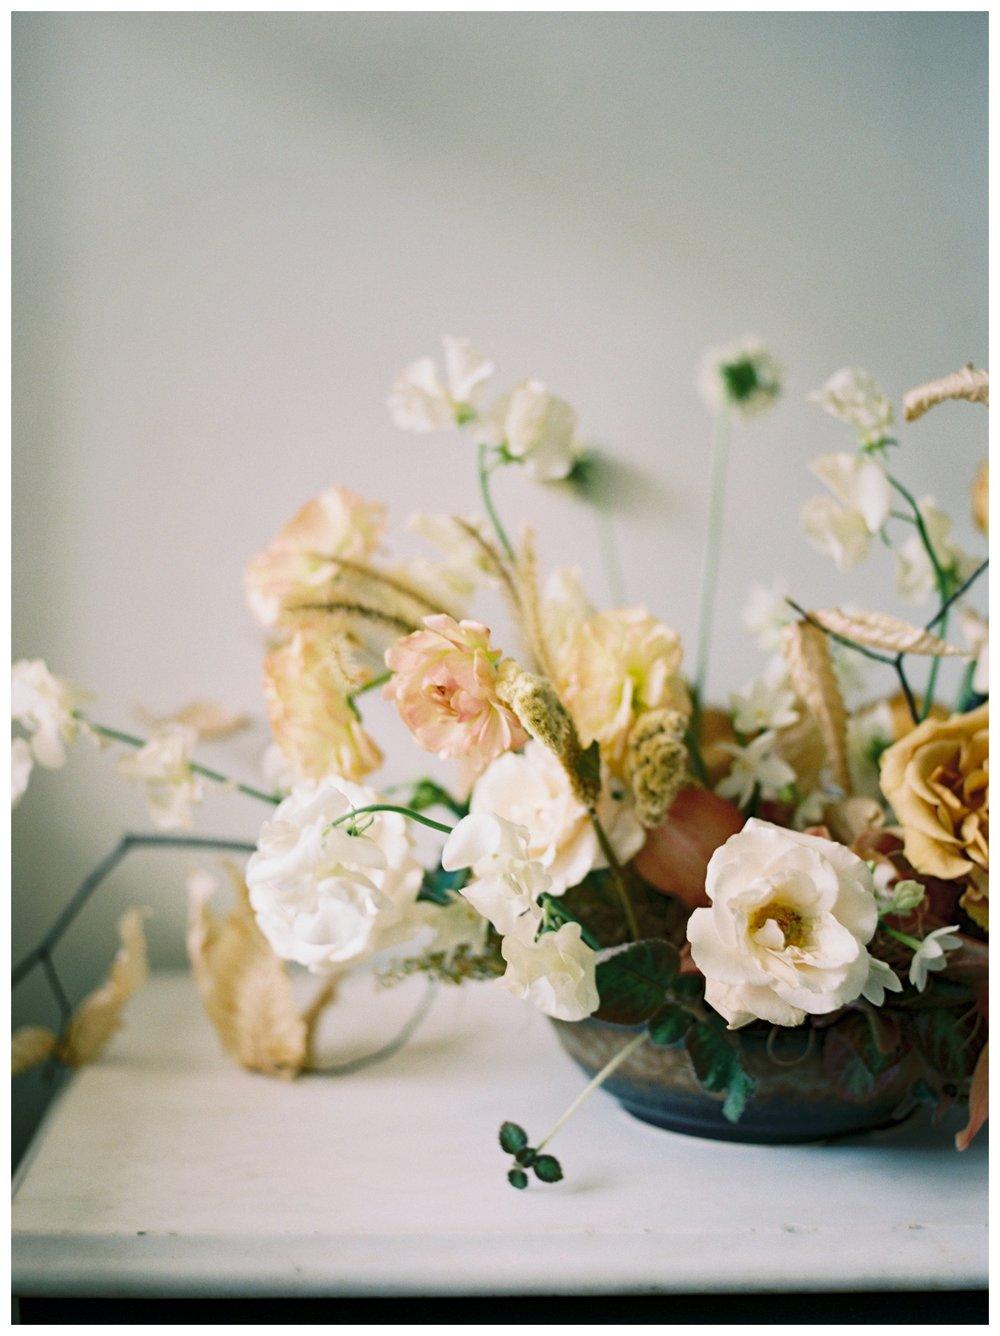 Kelly Lenard florals